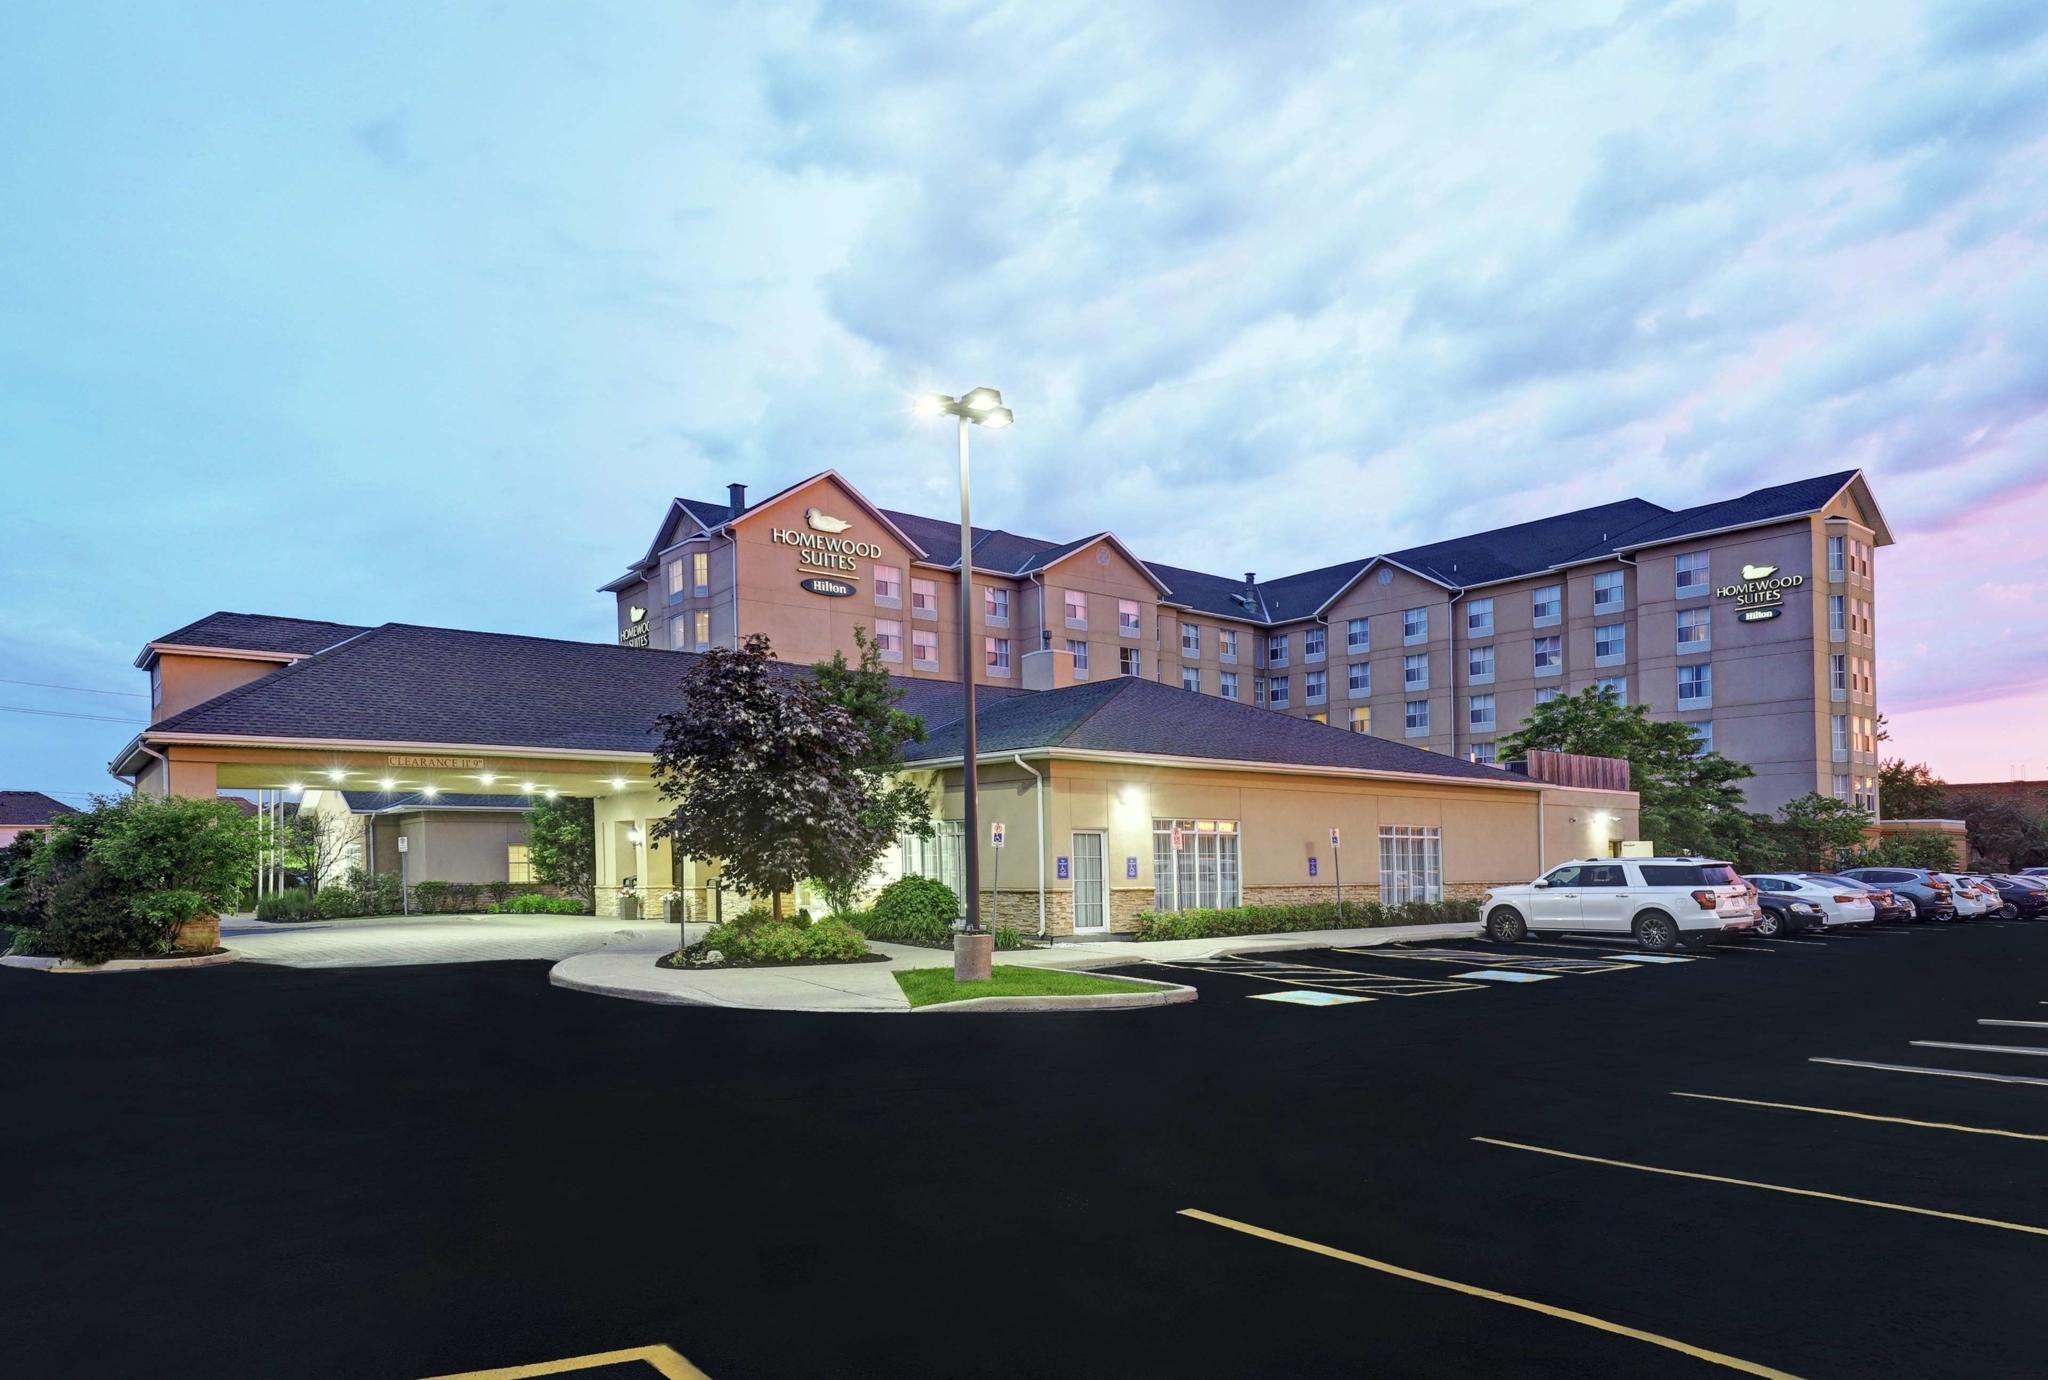 Homewood Suites by Hilton Cambridge-Waterloo, Ontario - Hotels